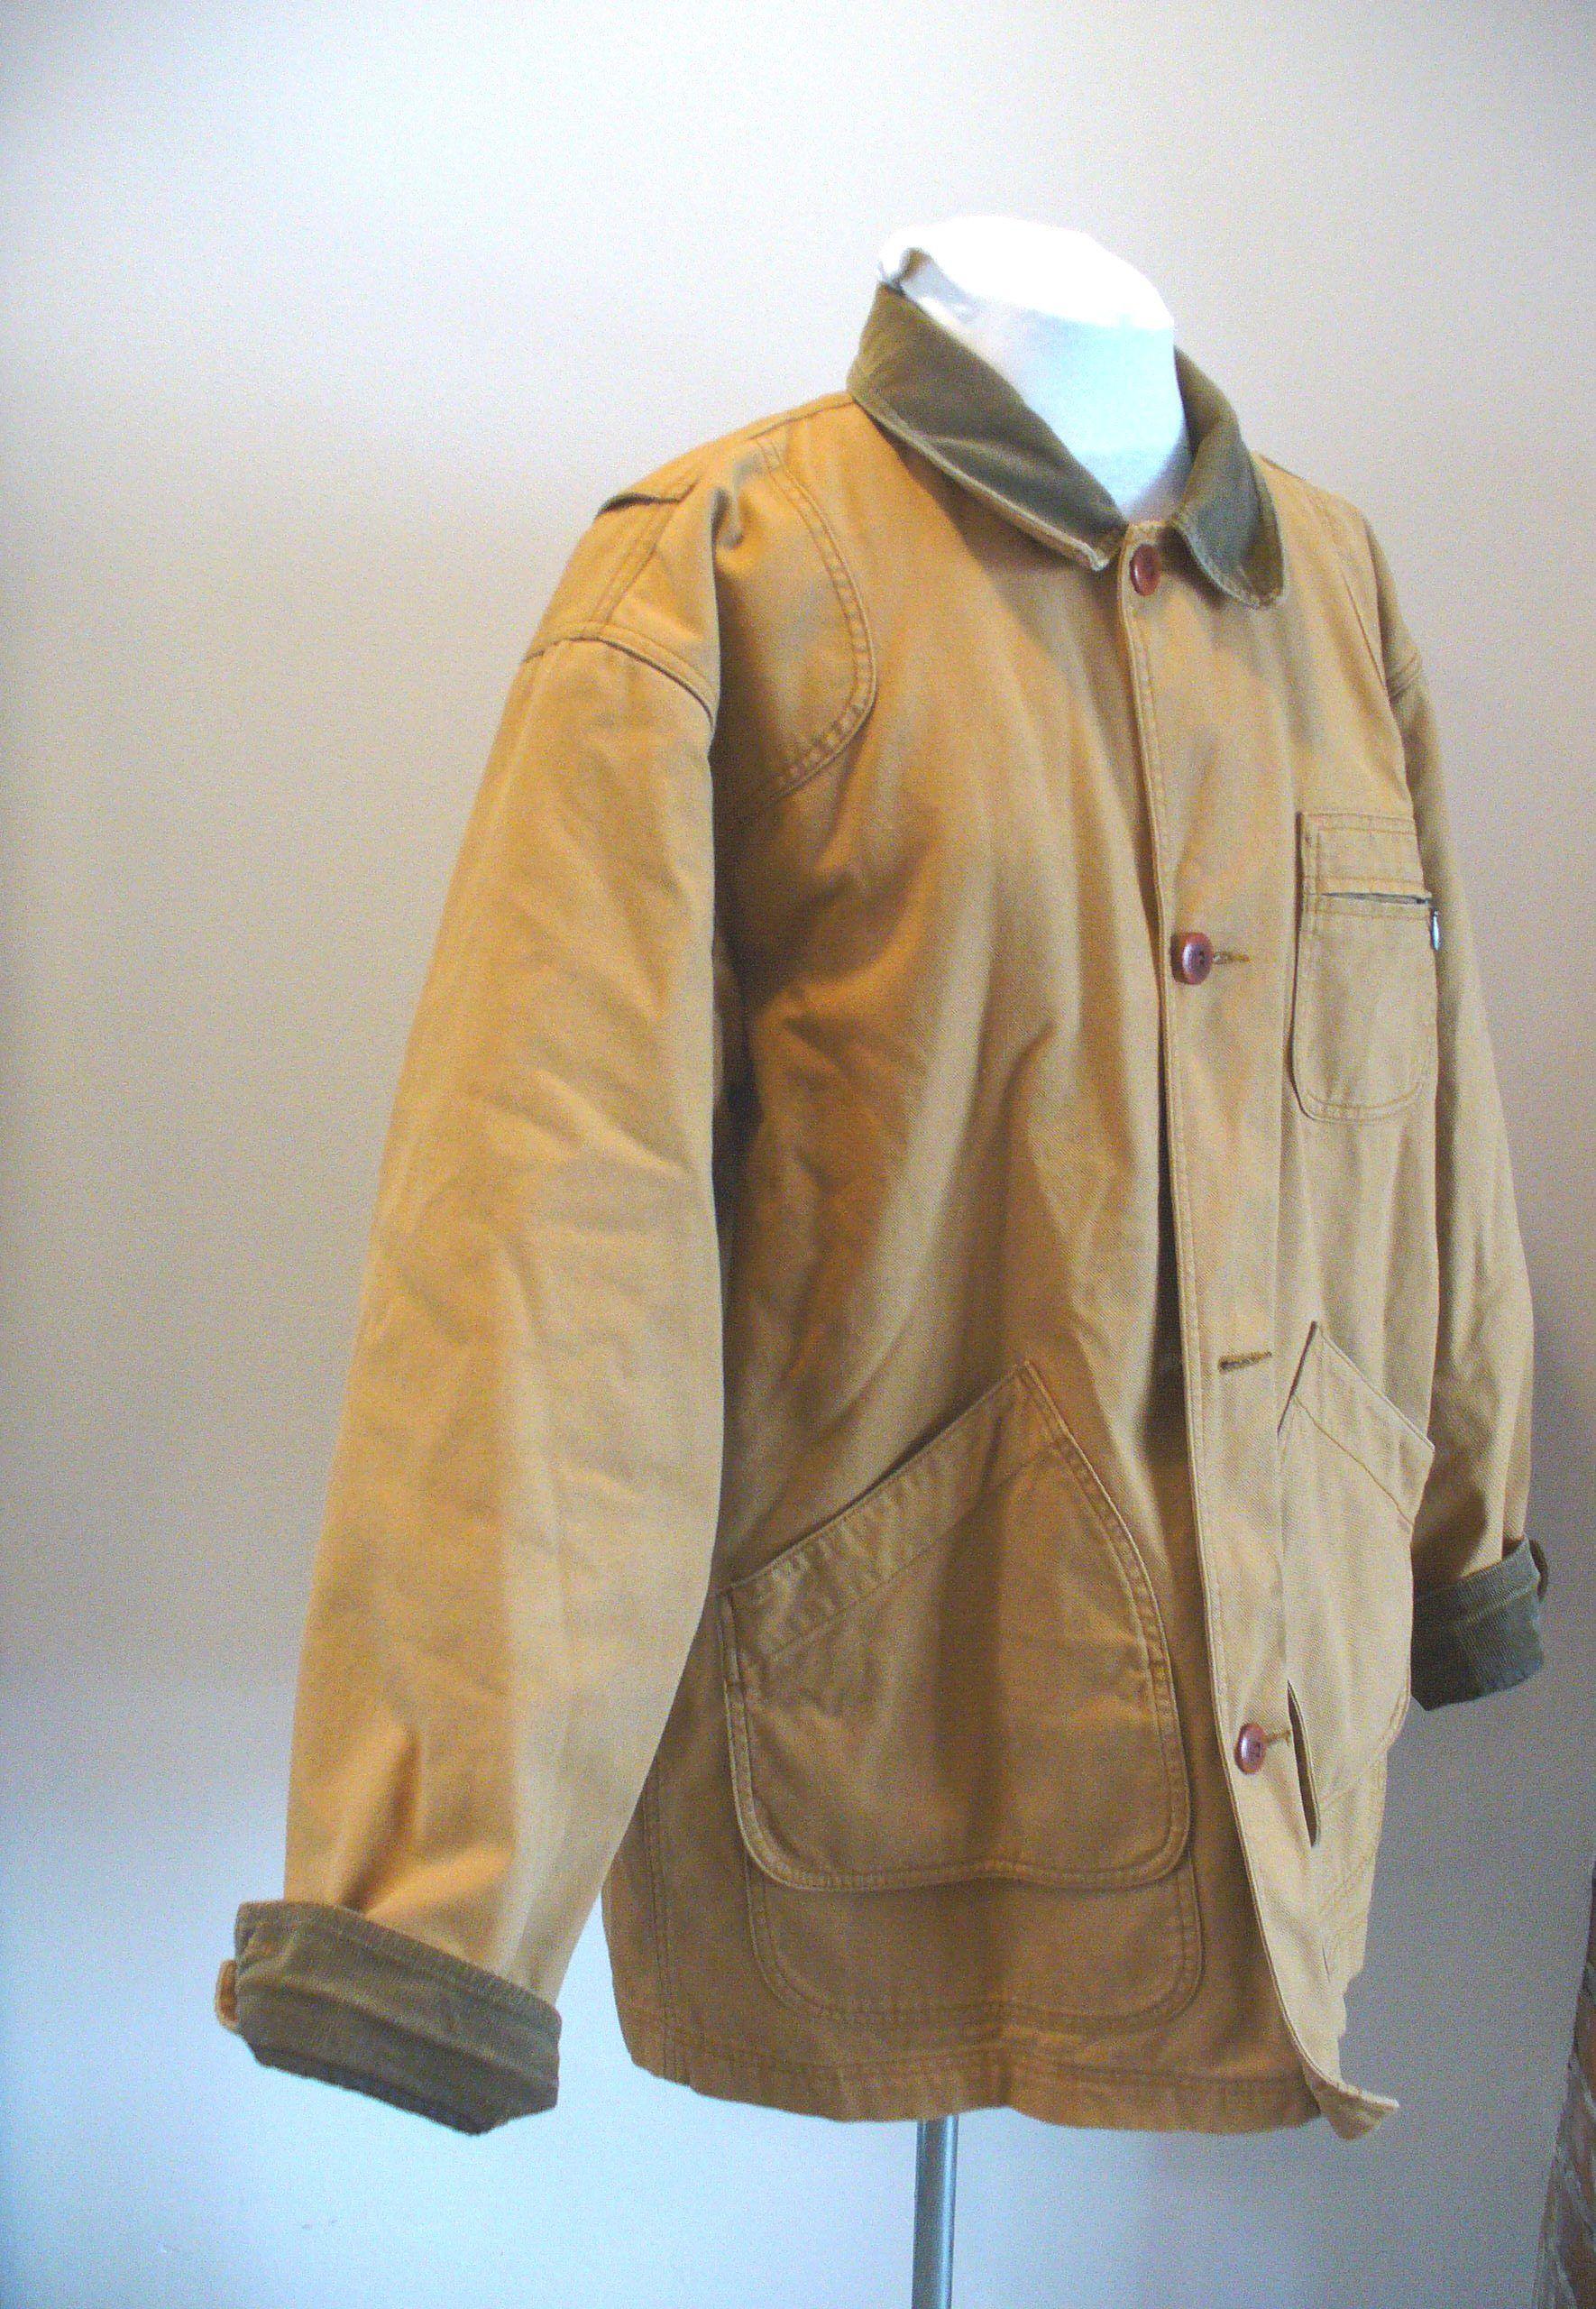 barn t s black belstaff men brown new coat jackets coats tourmaster barns jacket mens designer